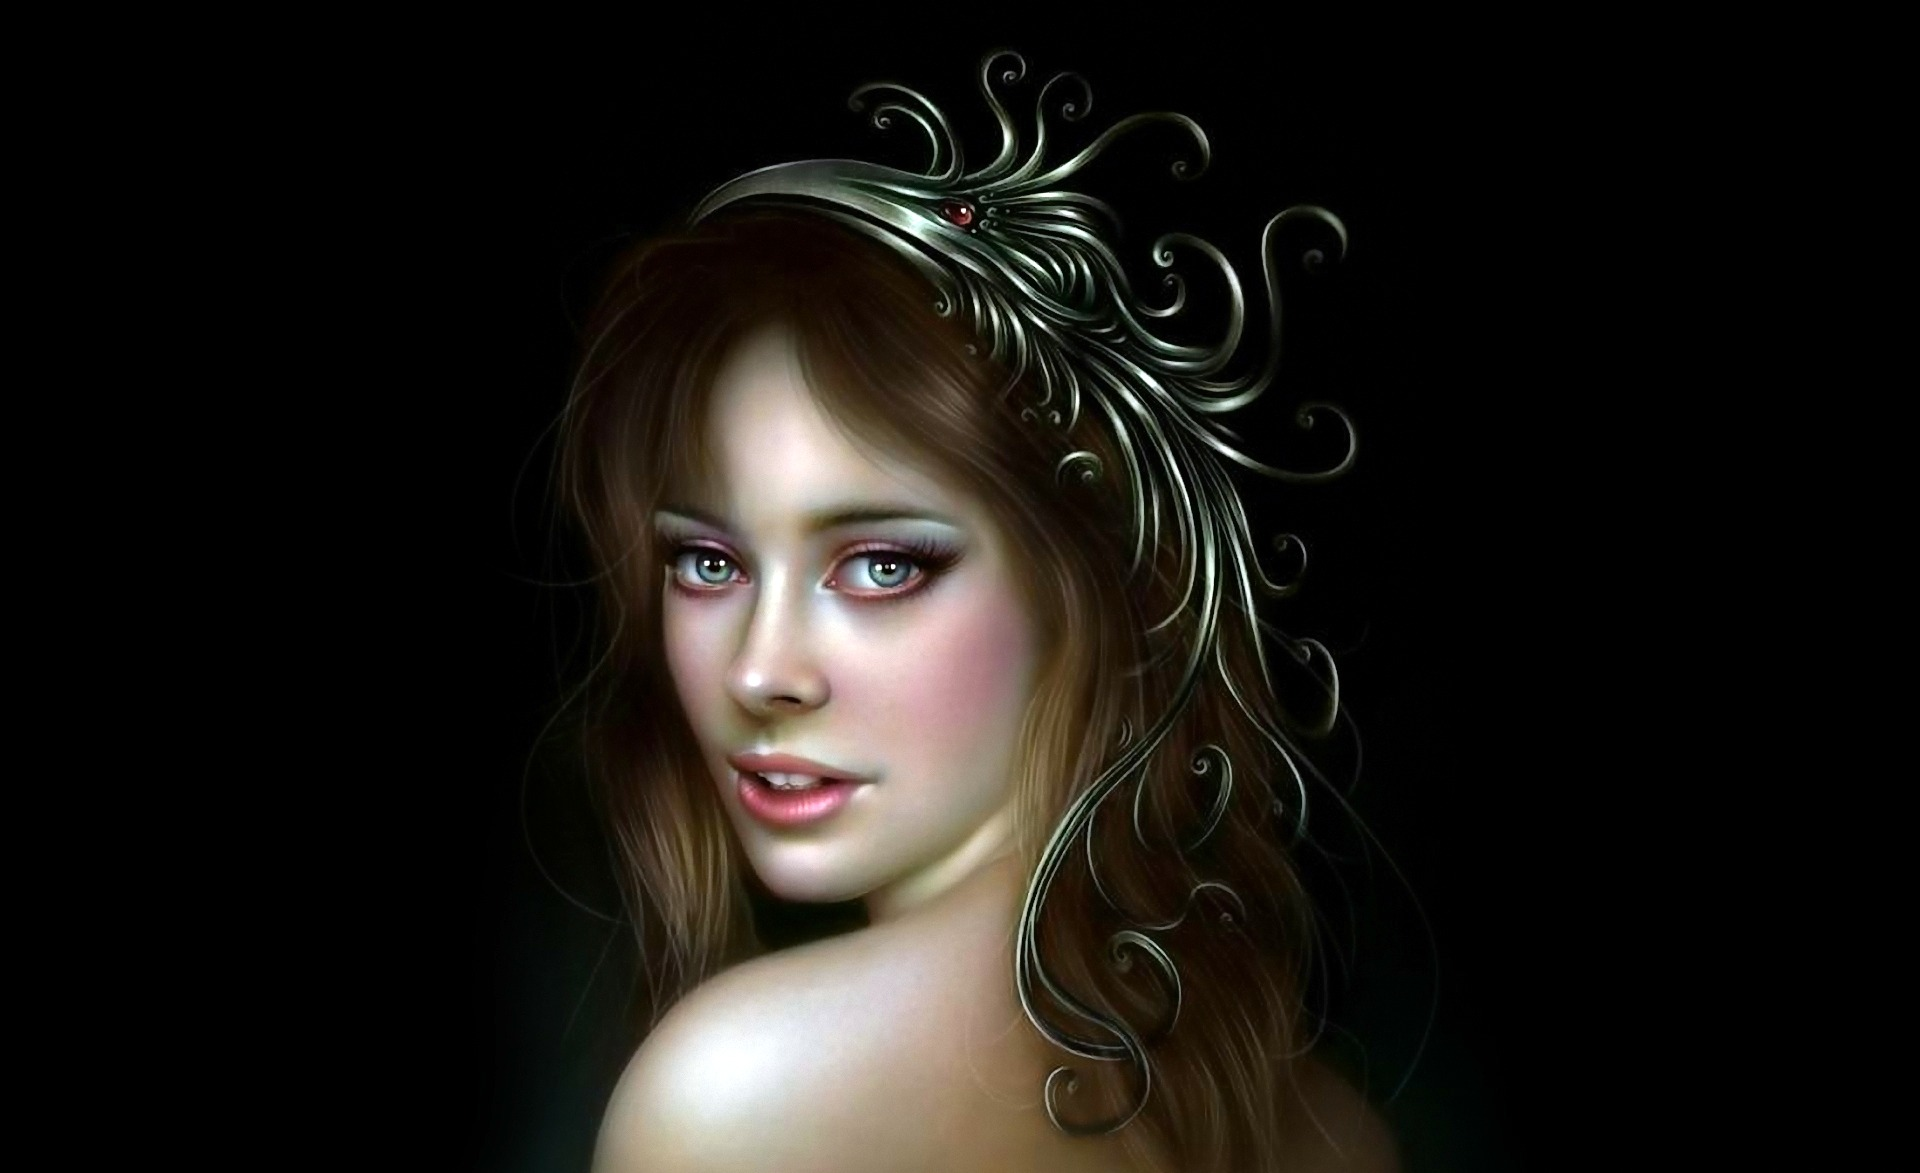 Women full hd wallpaper and background image 1920x1173 - Fantastic girl wallpaper hd ...